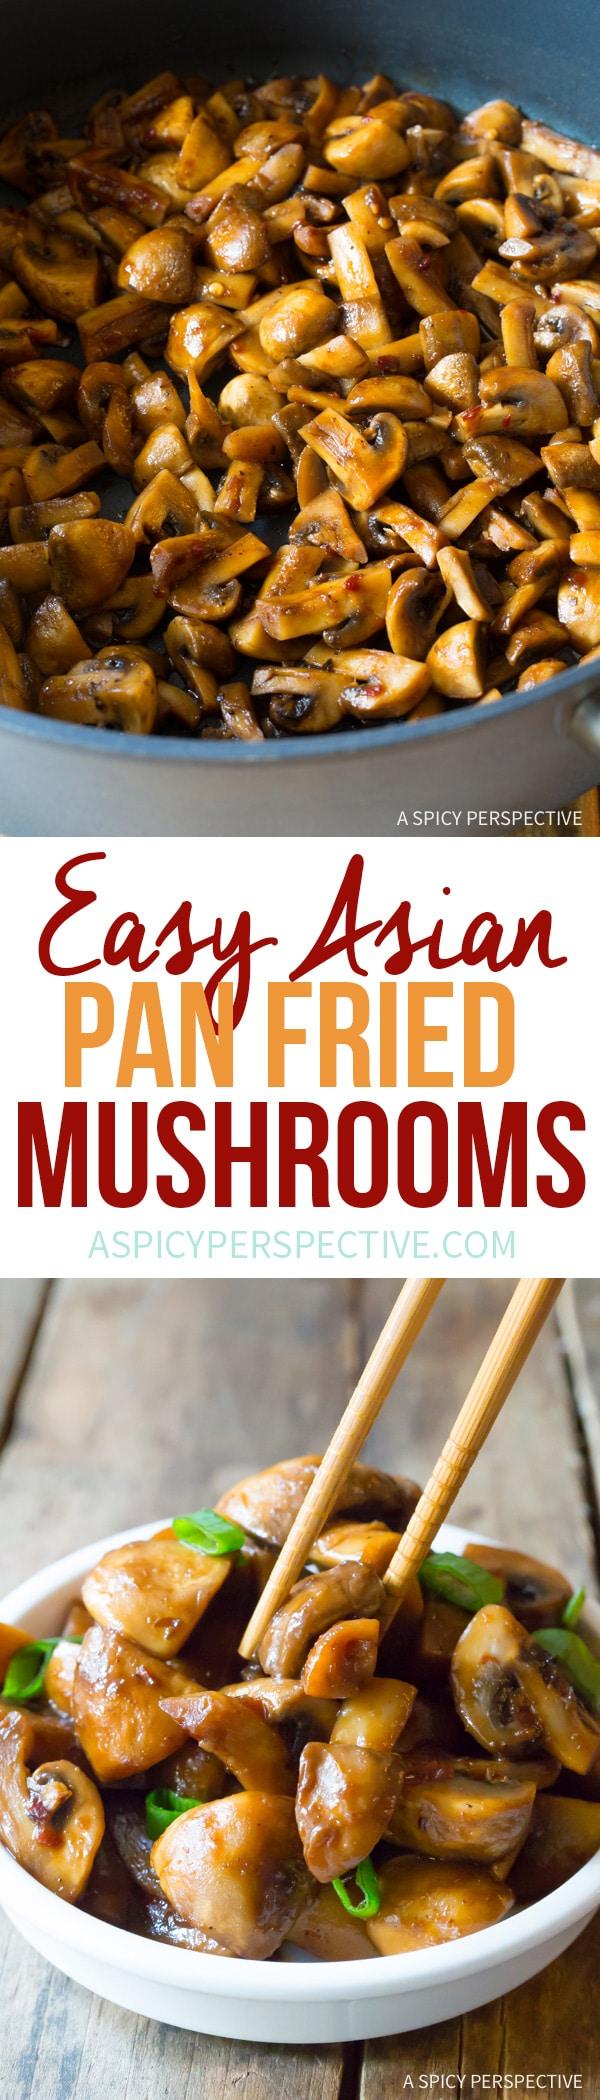 Perfect Asian Stir Fried Mushrooms Recipe